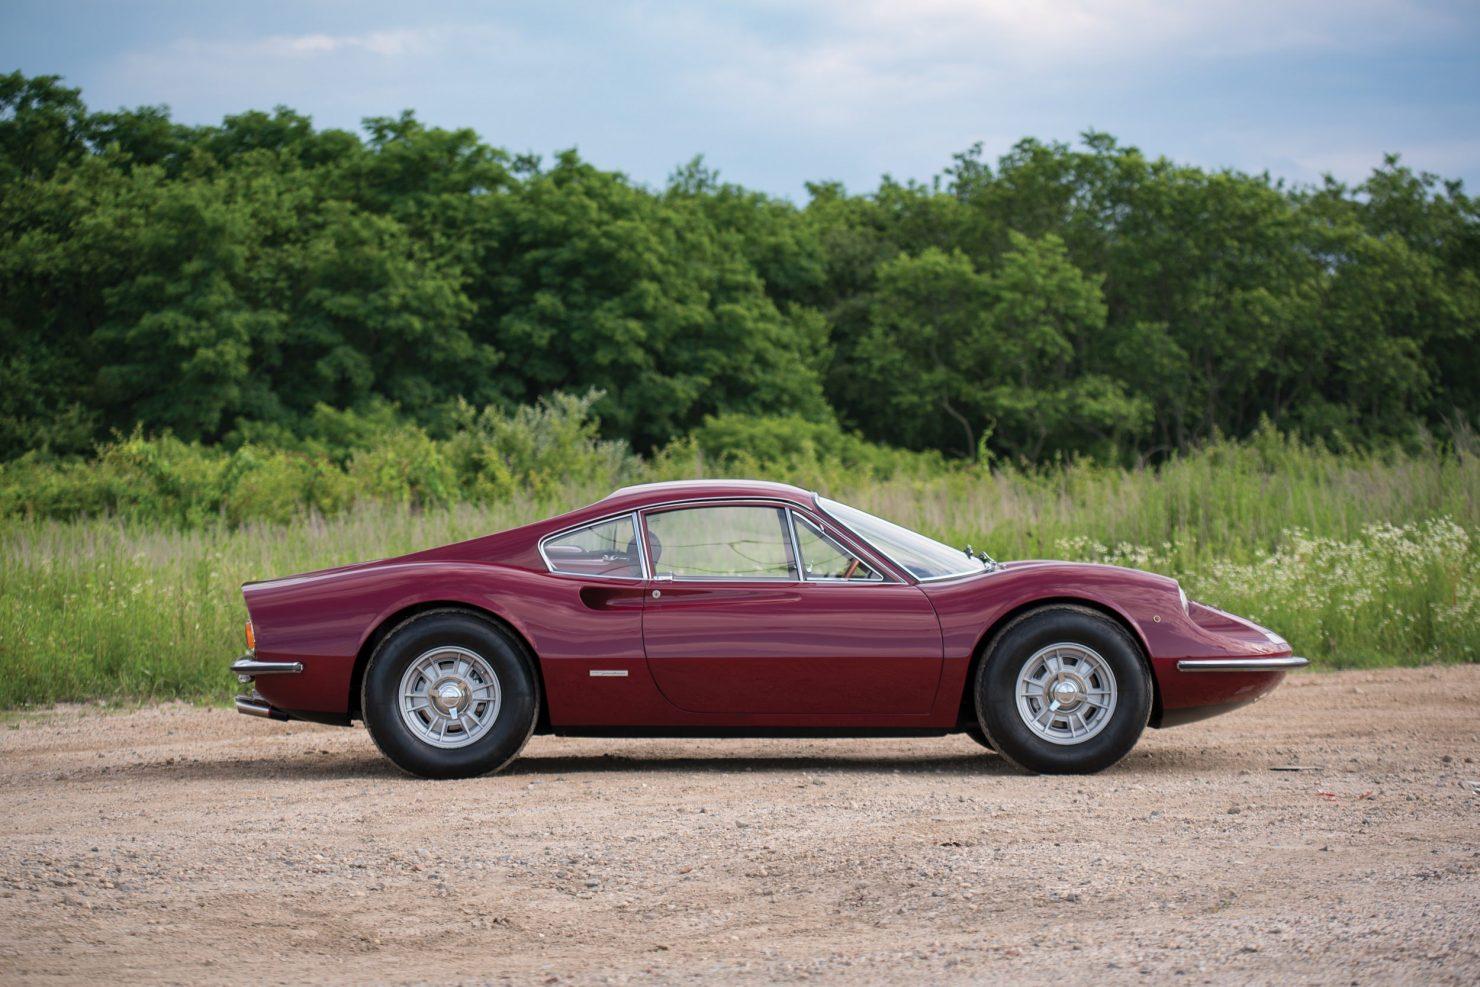 ferrari dino 246 5 1480x987 - 1969 Ferrari Dino 246 GT